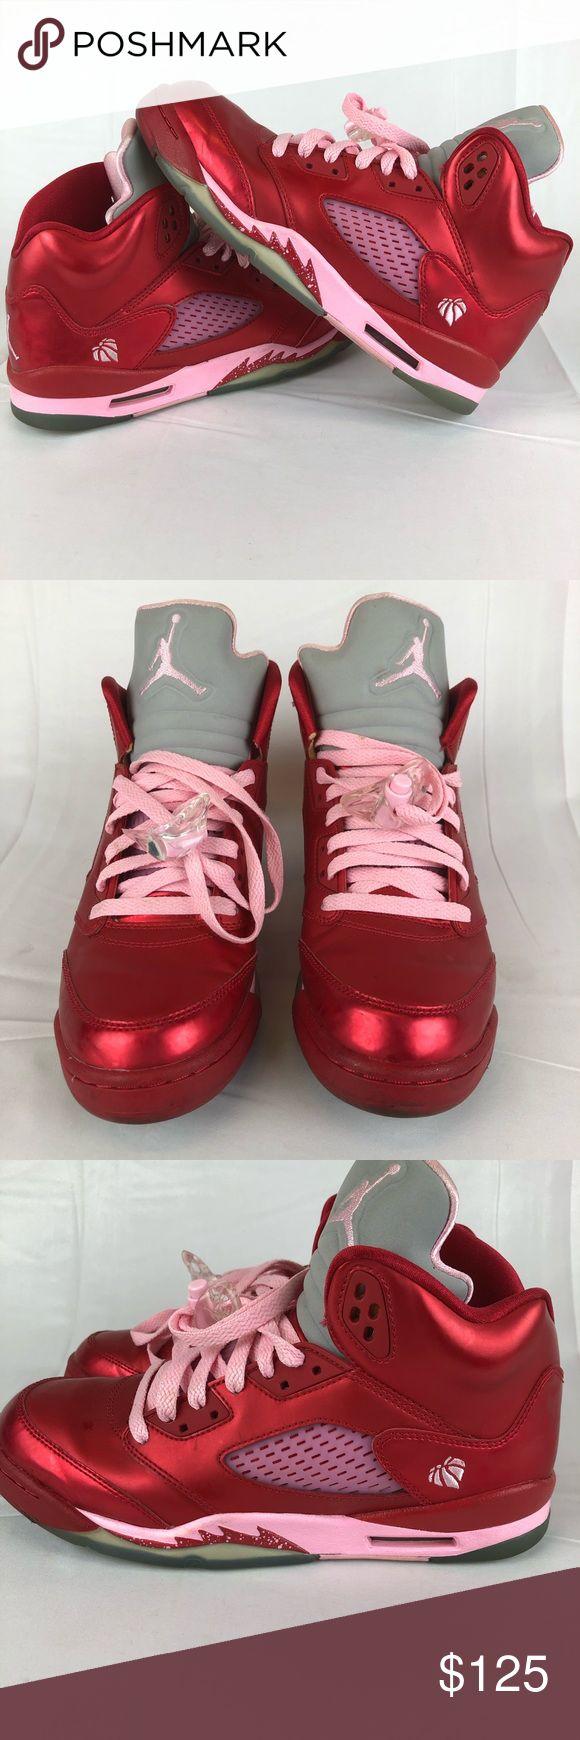 Nike Air Jordan Retro 5s Valentines 440892605 Air